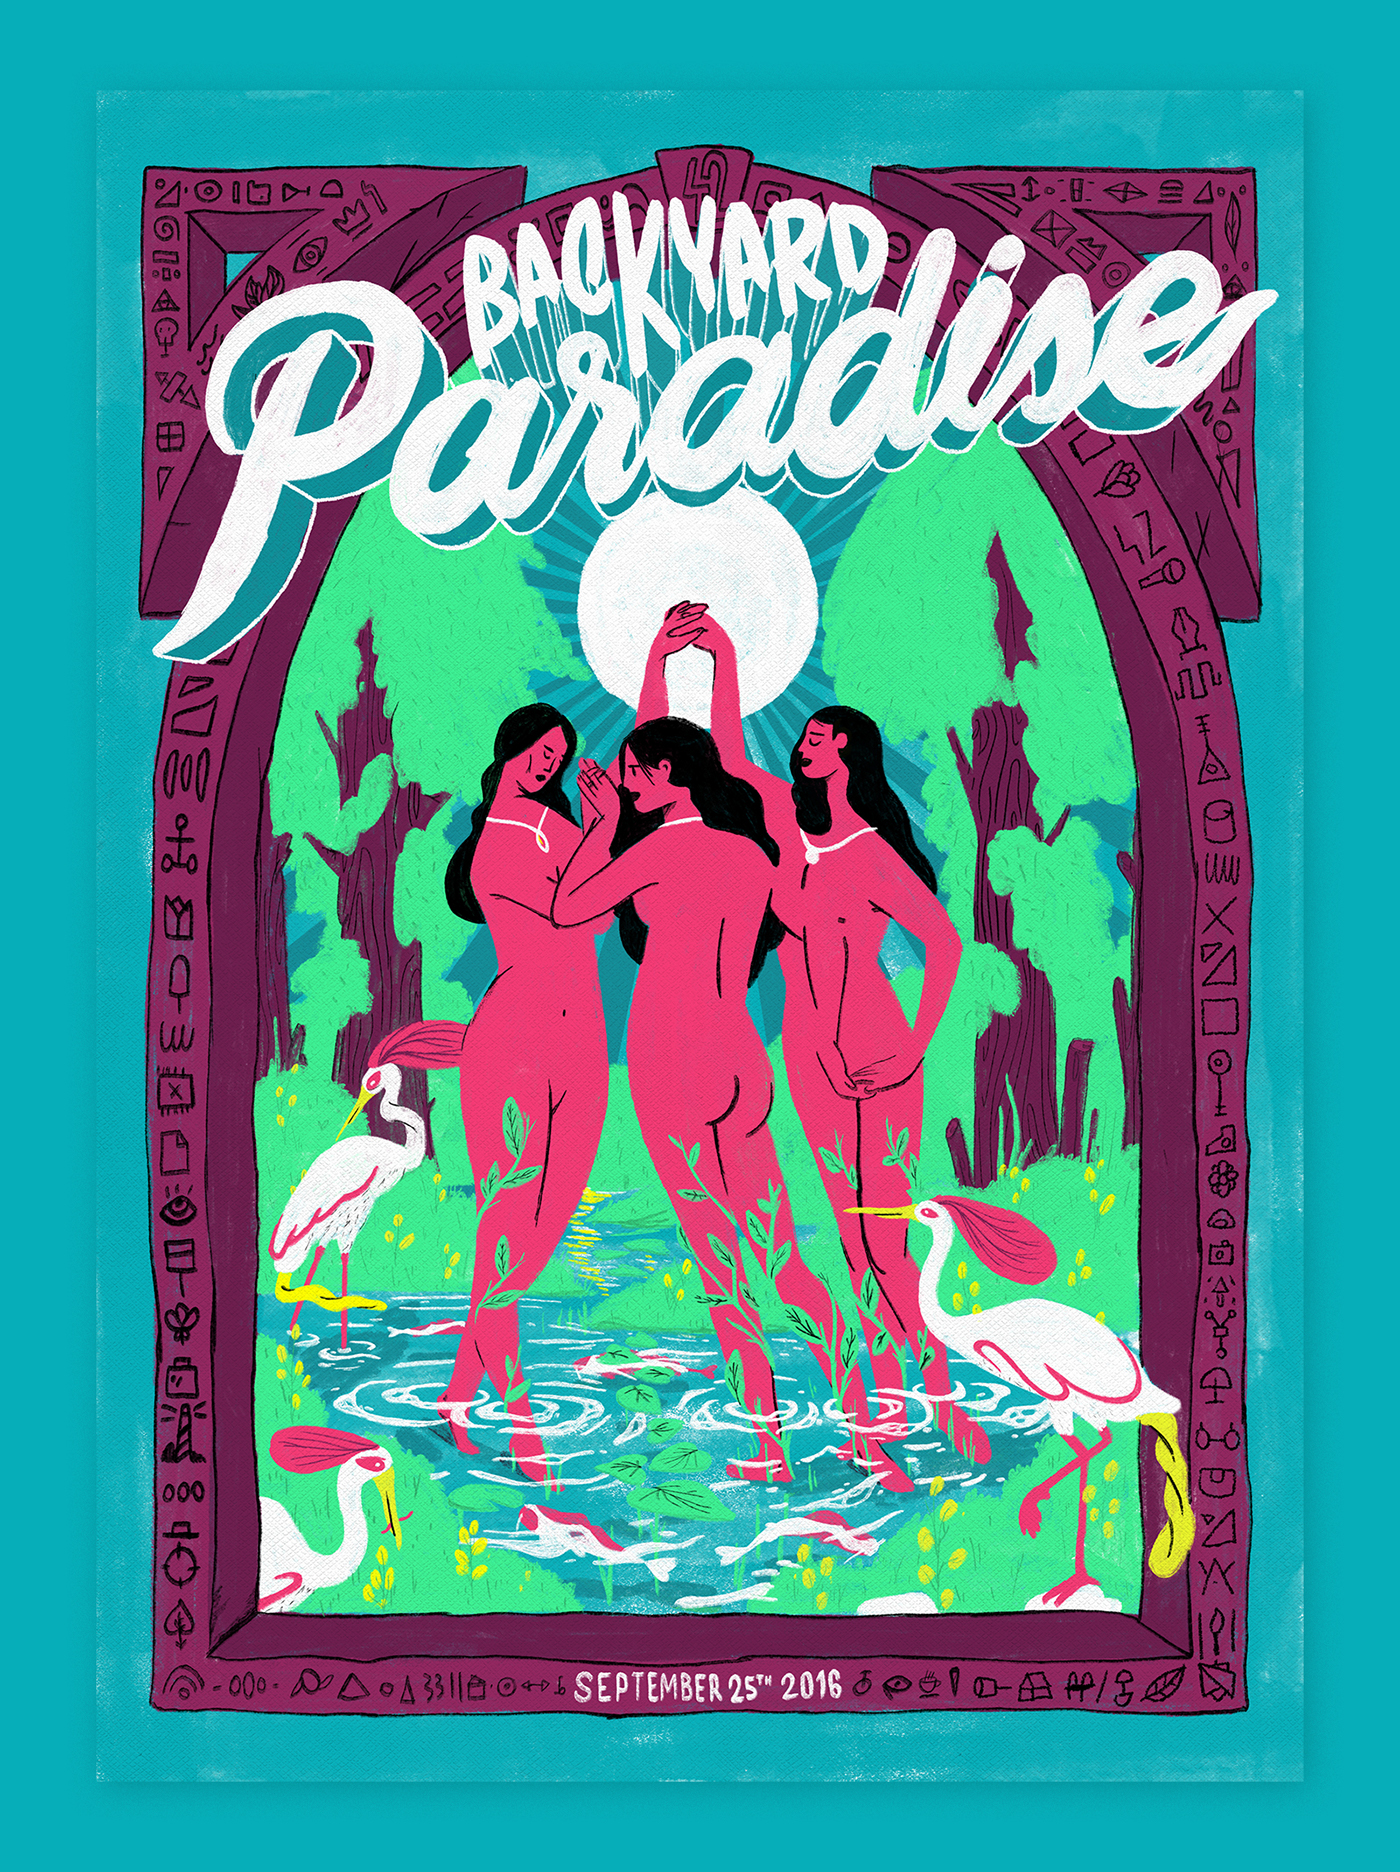 Backyard Paradise 4 on Behance